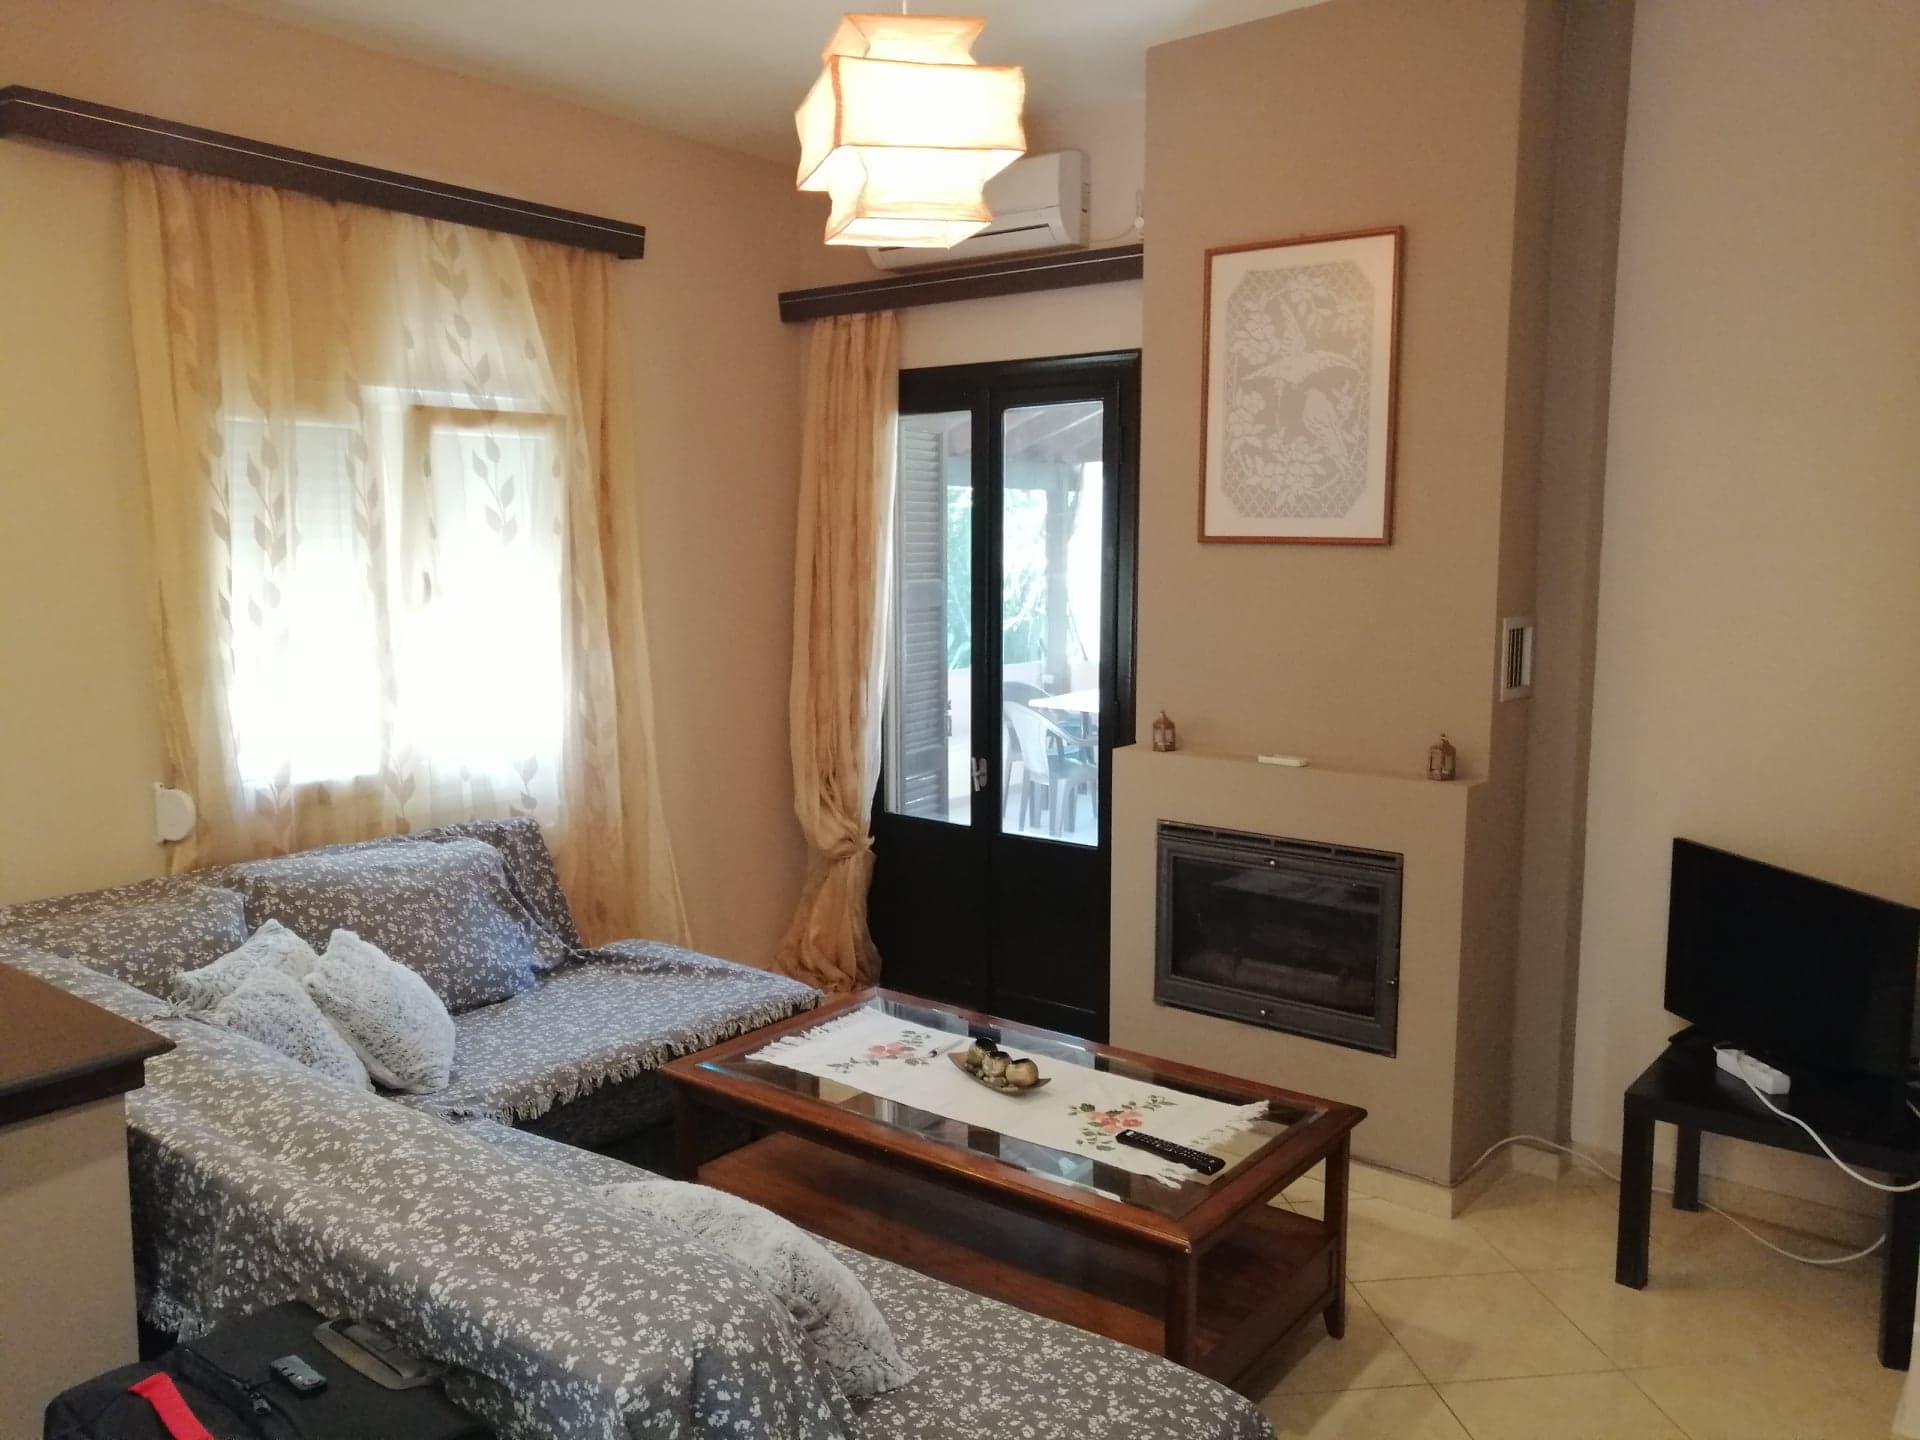 Samos Option 21 (64 sq.m-1 bedroom)